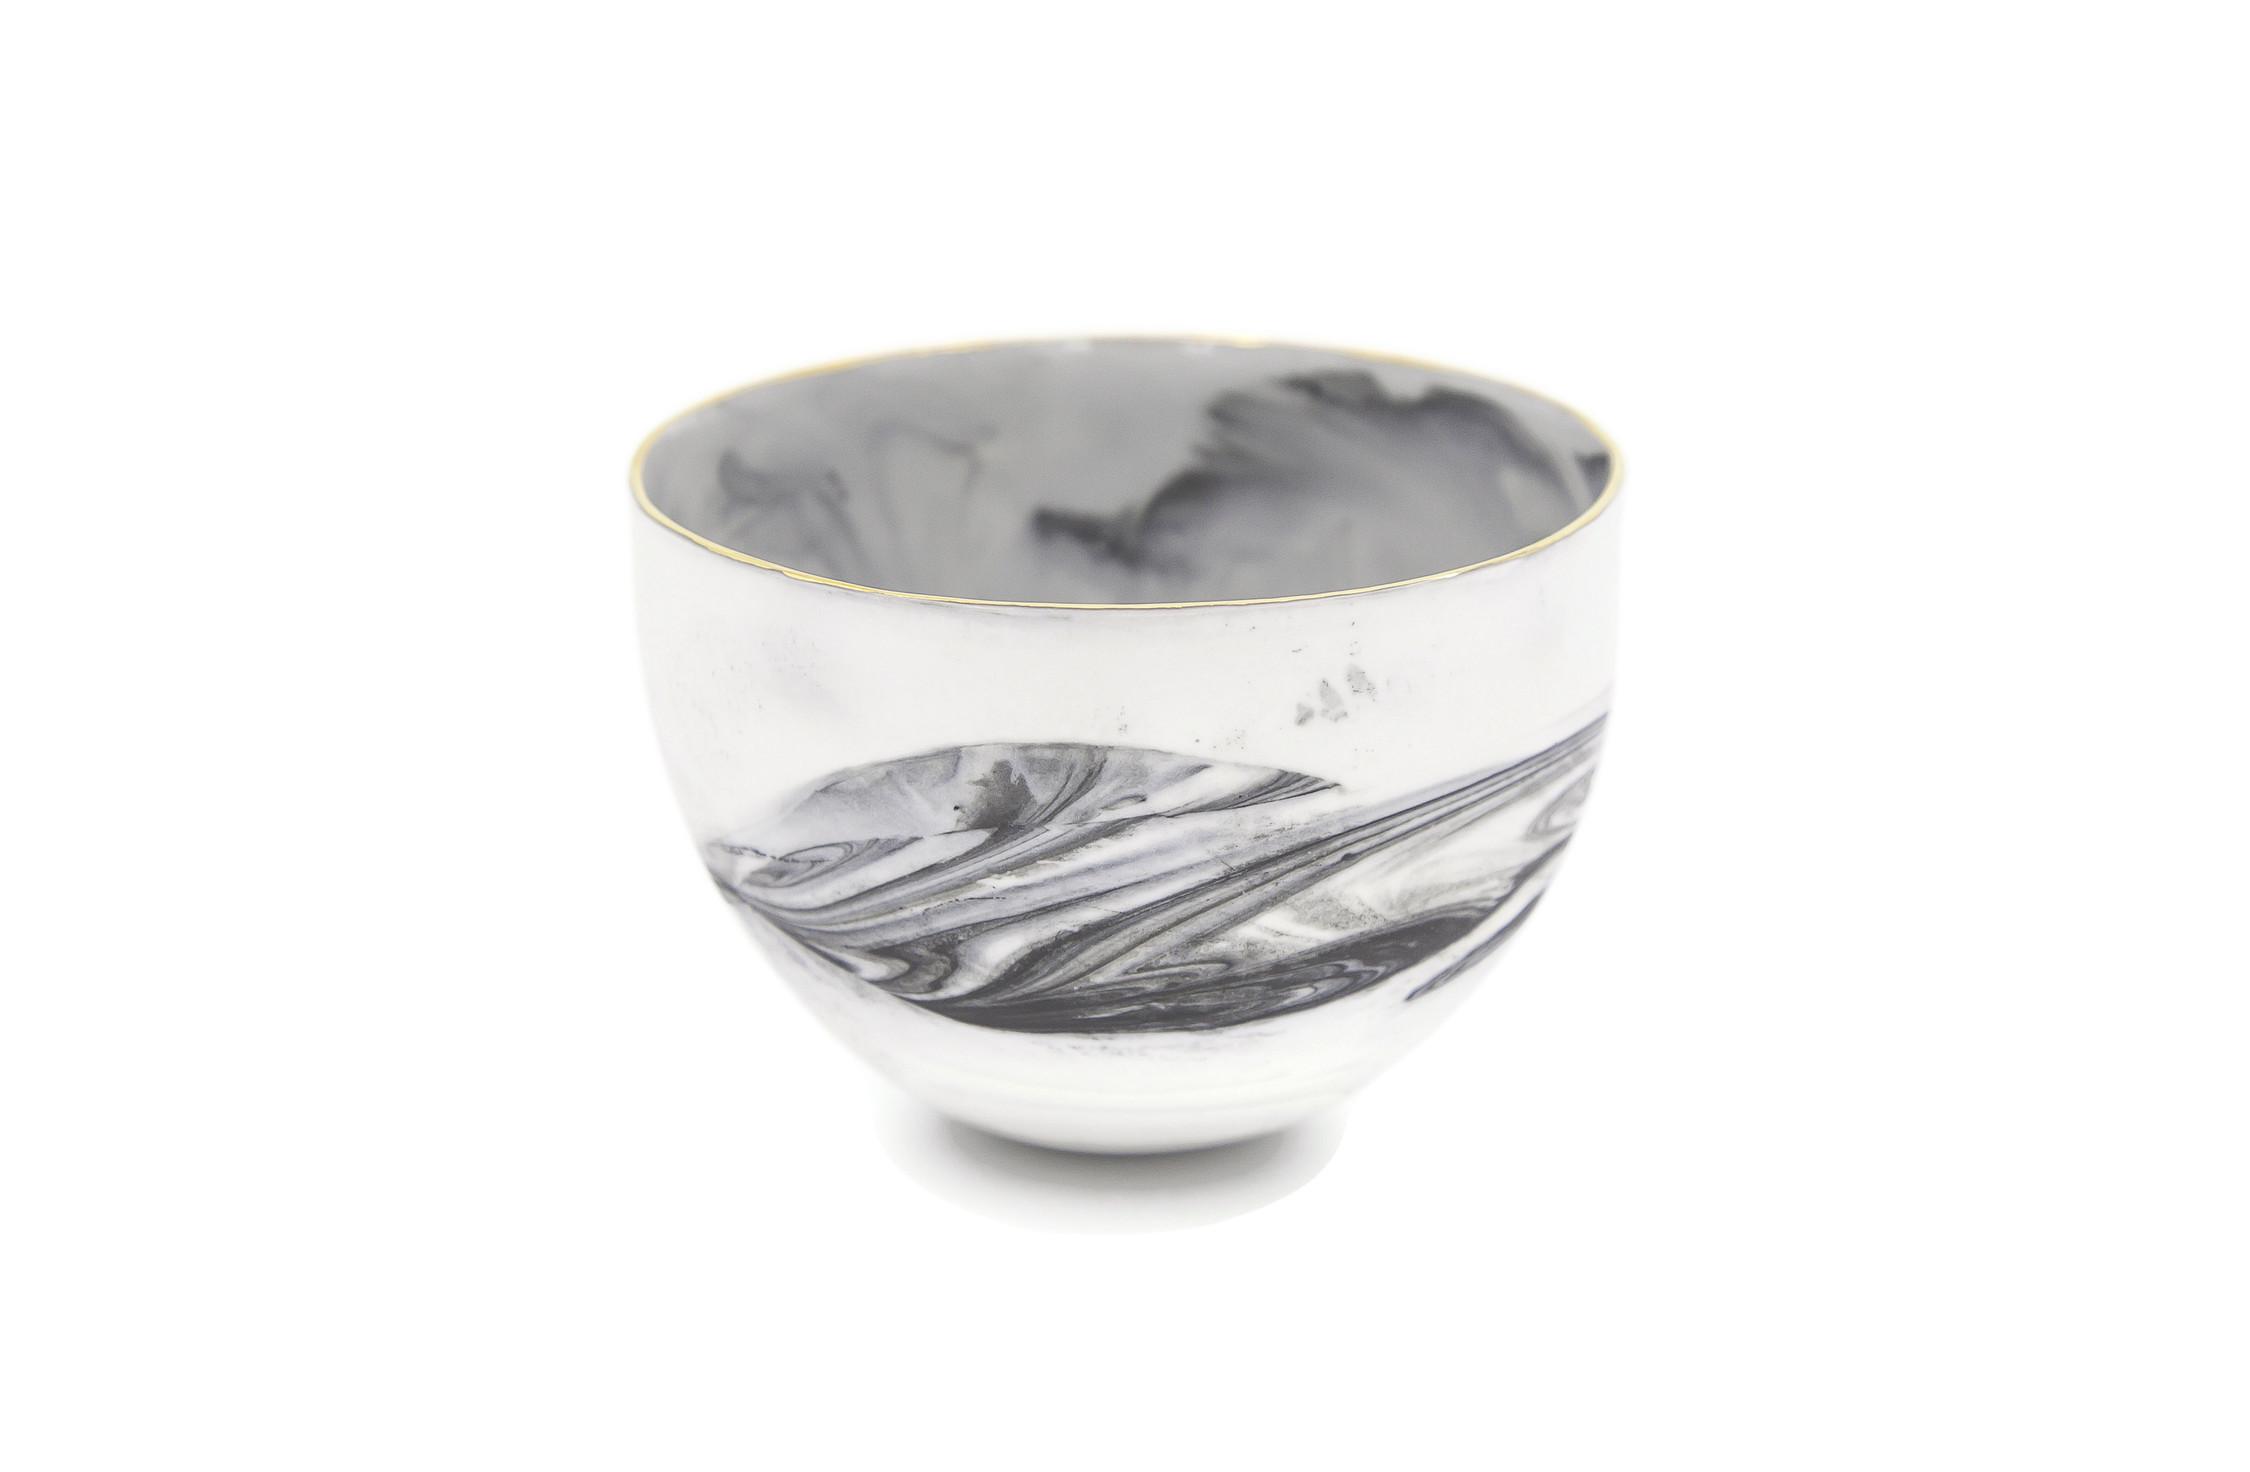 Collectible Porcelain Marble Bowl. Snack bowl, rice bowl, tapas bowl, ceramic bowl, side dish bowl, dessert bowl, sorbet bowl